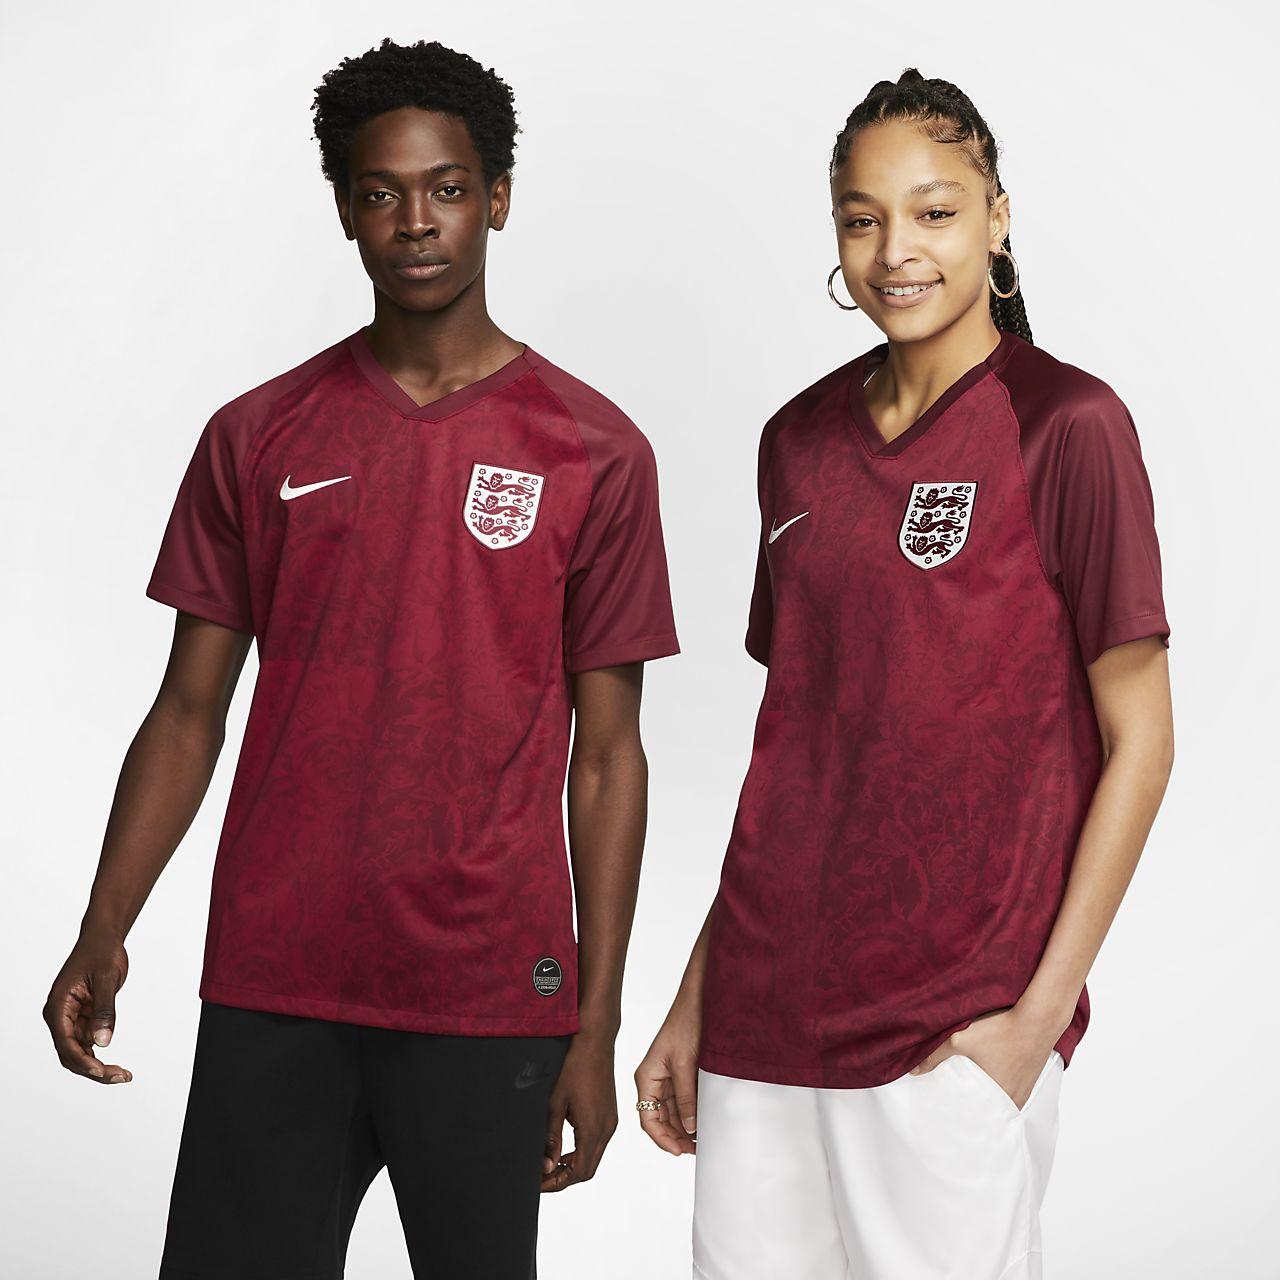 d7d7ce953 England 2019 Stadium Away Men s Football Shirt. Nike.com NL